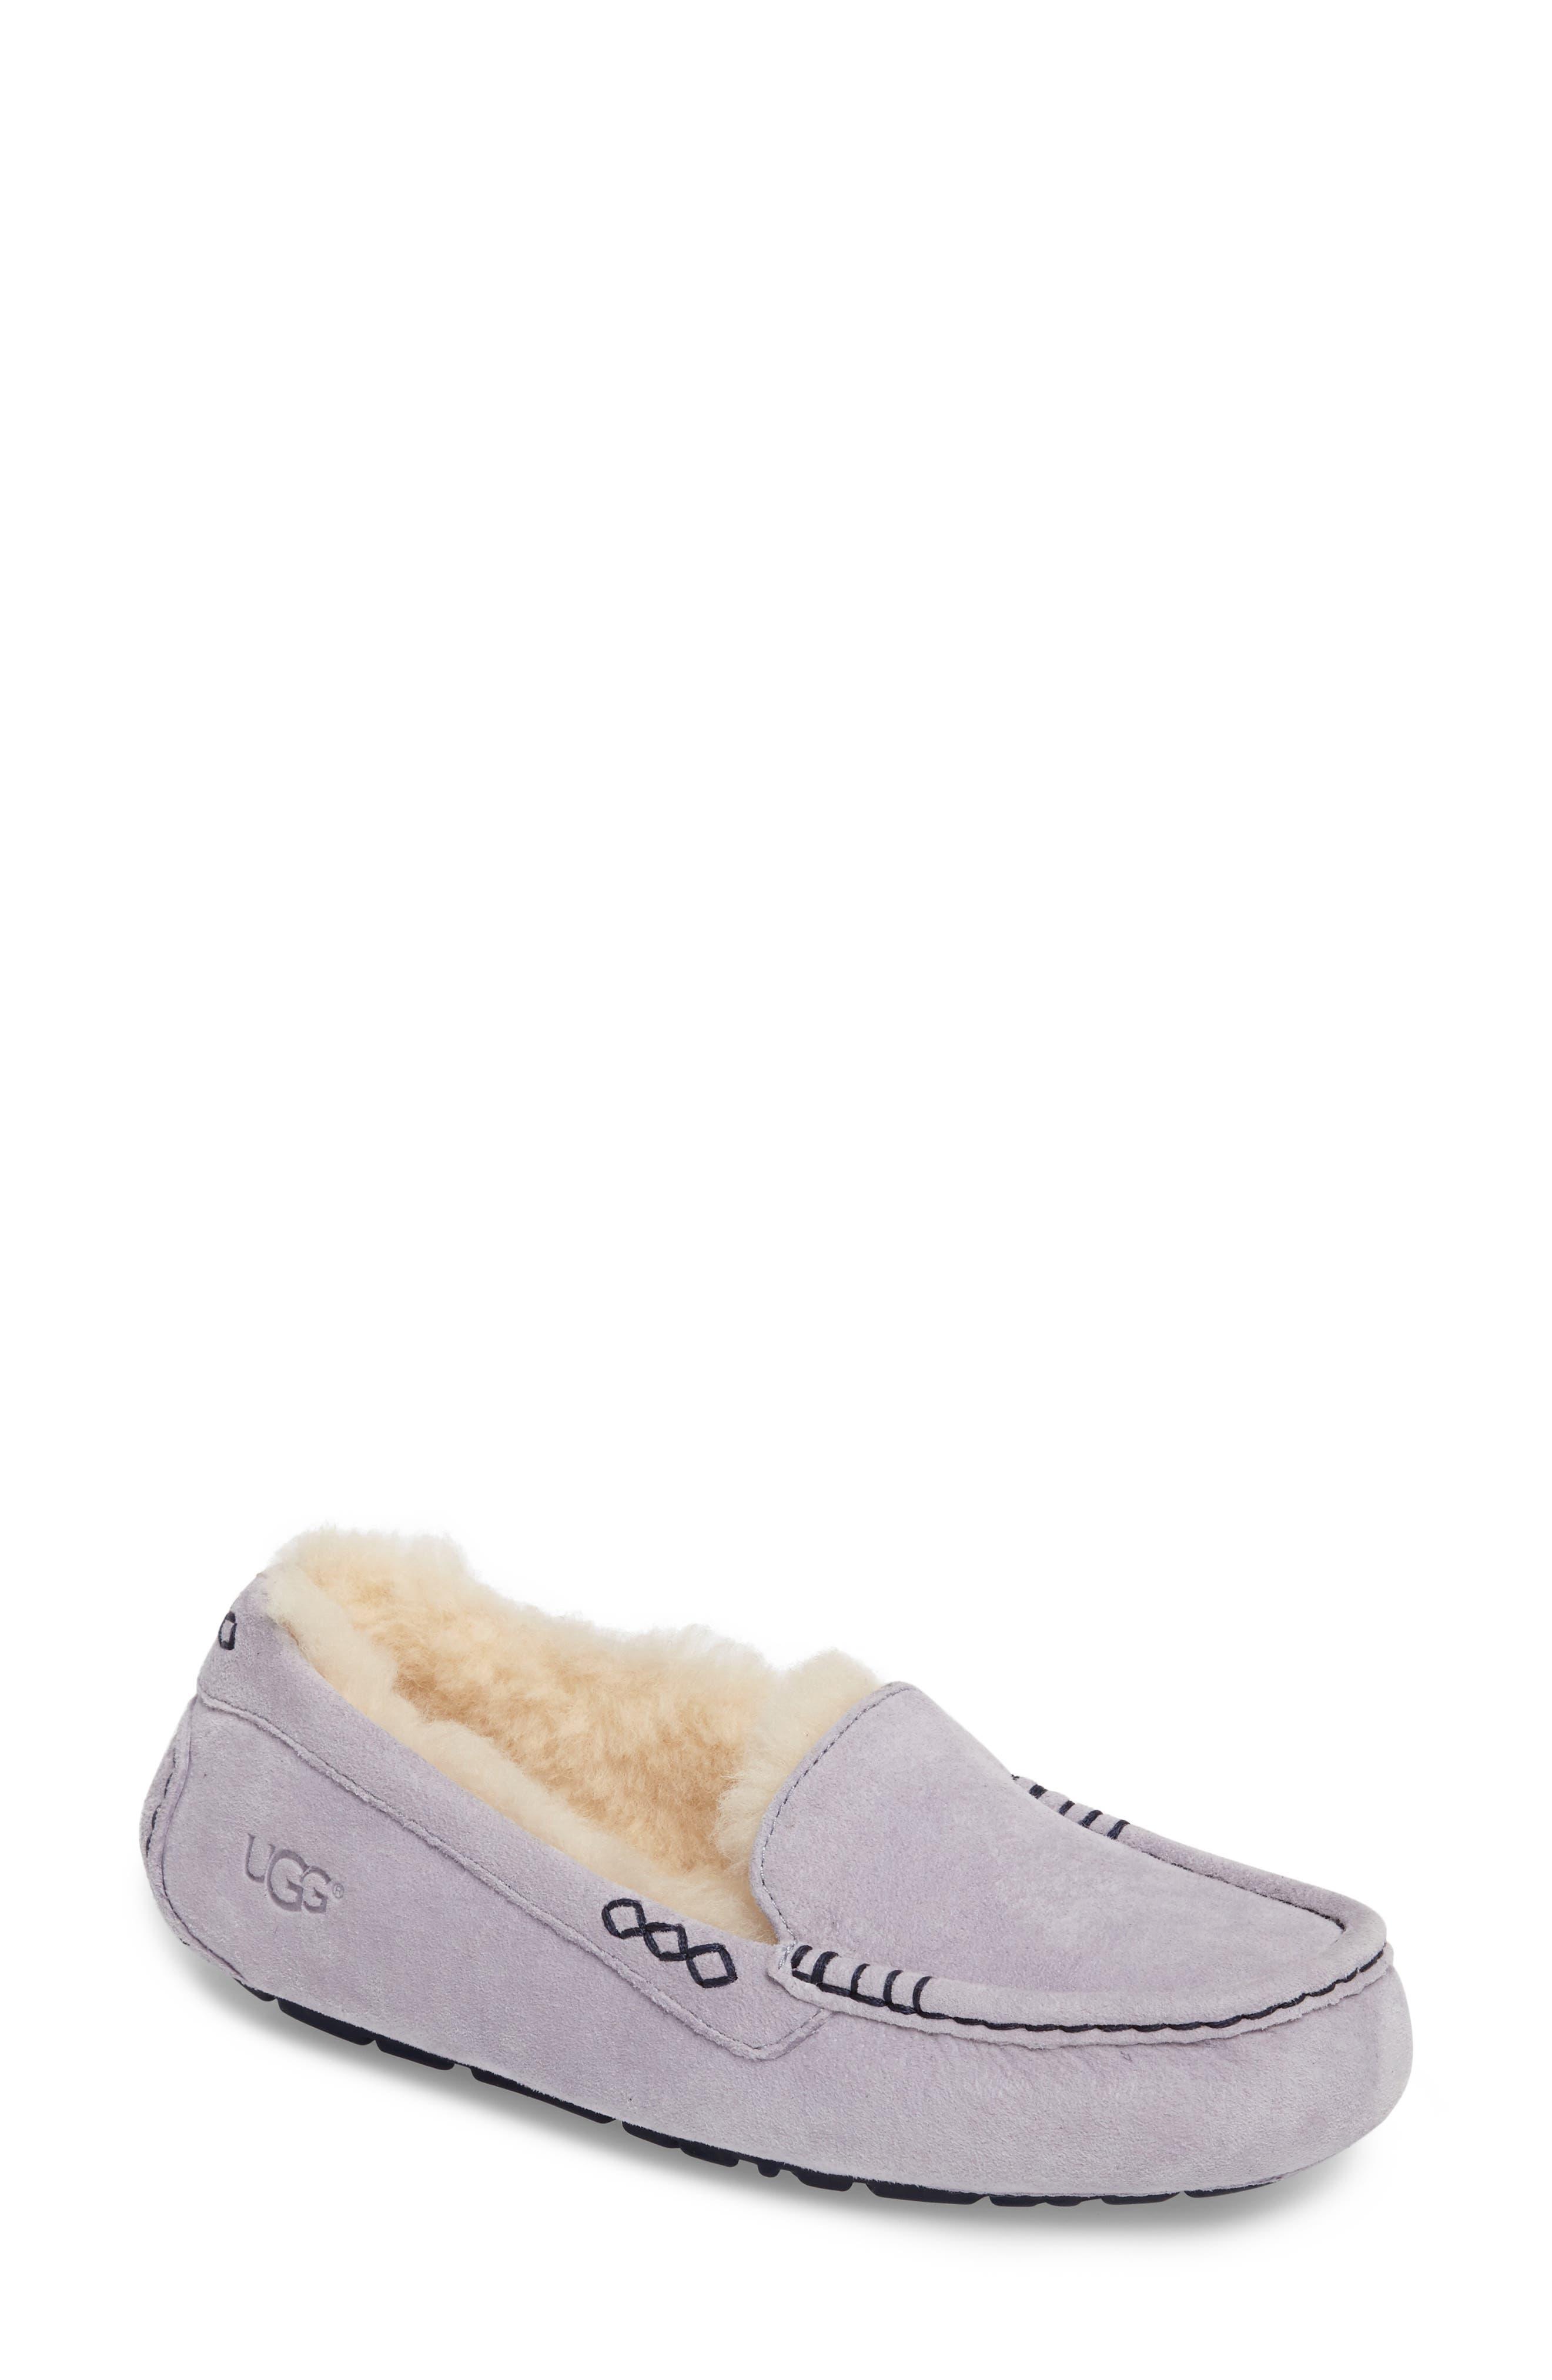 Main Image - UGG® Ansley Water Resistant Slipper (Women)